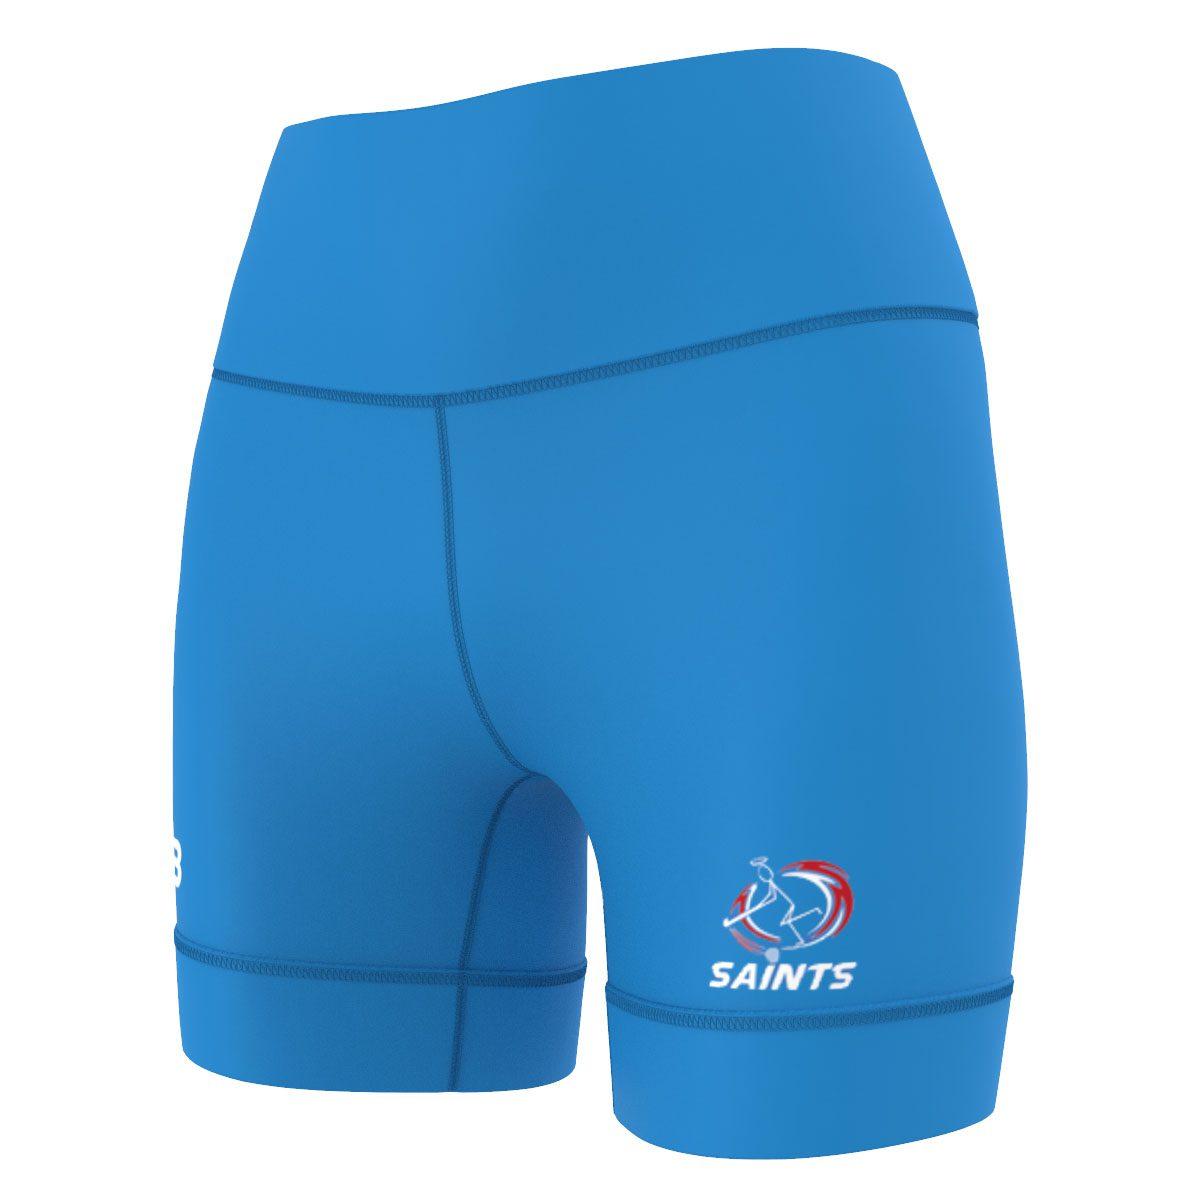 Custom Sublimated Hockey Boyleg Shorts - Your Design, Unlimited Colours and Logos